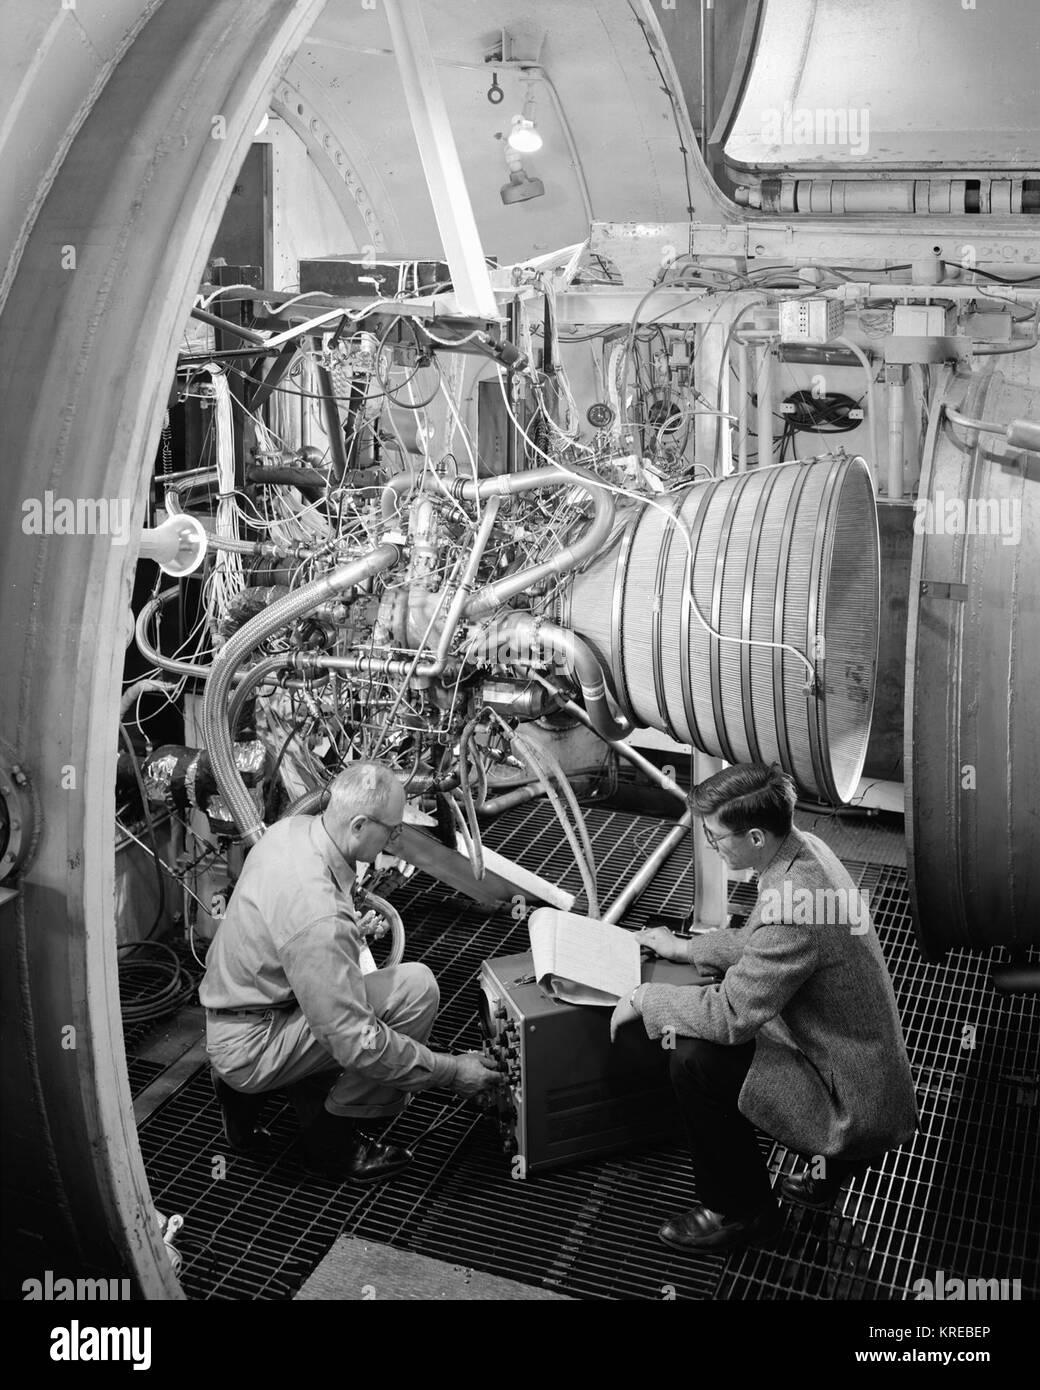 Centaur Rocket Installation in PSL -1 - GPN-2000-000698 - Stock Image